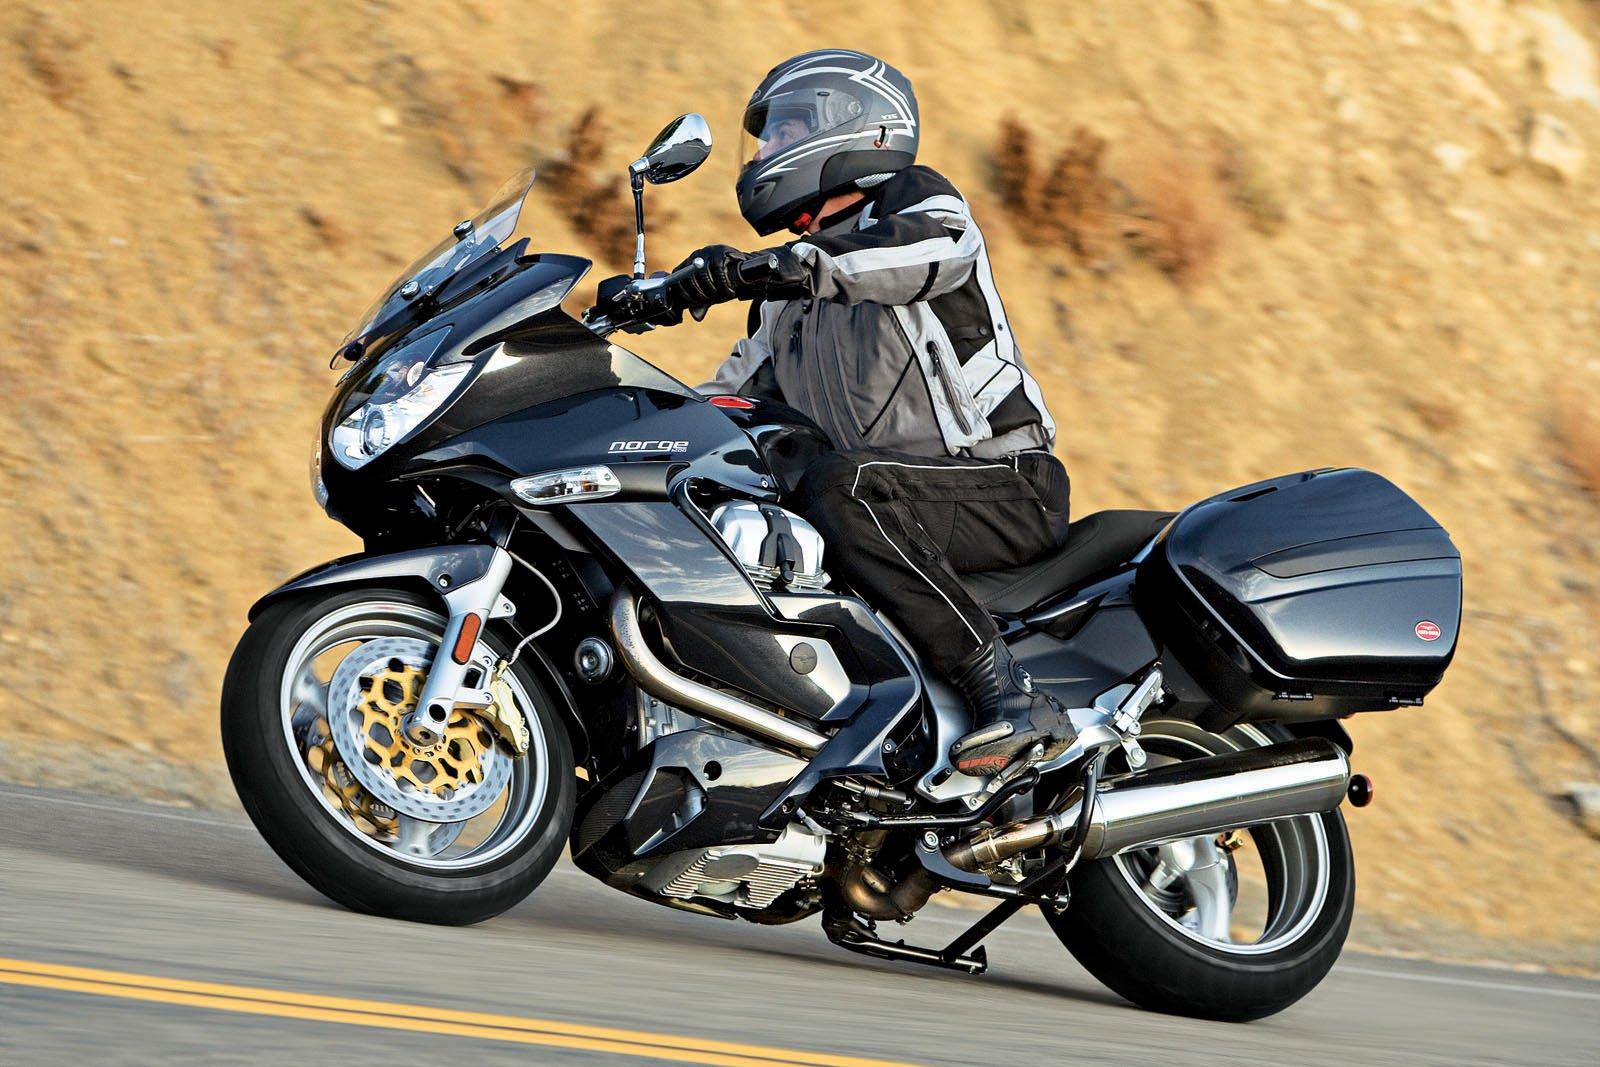 2008 Moto Guzzi Norge test